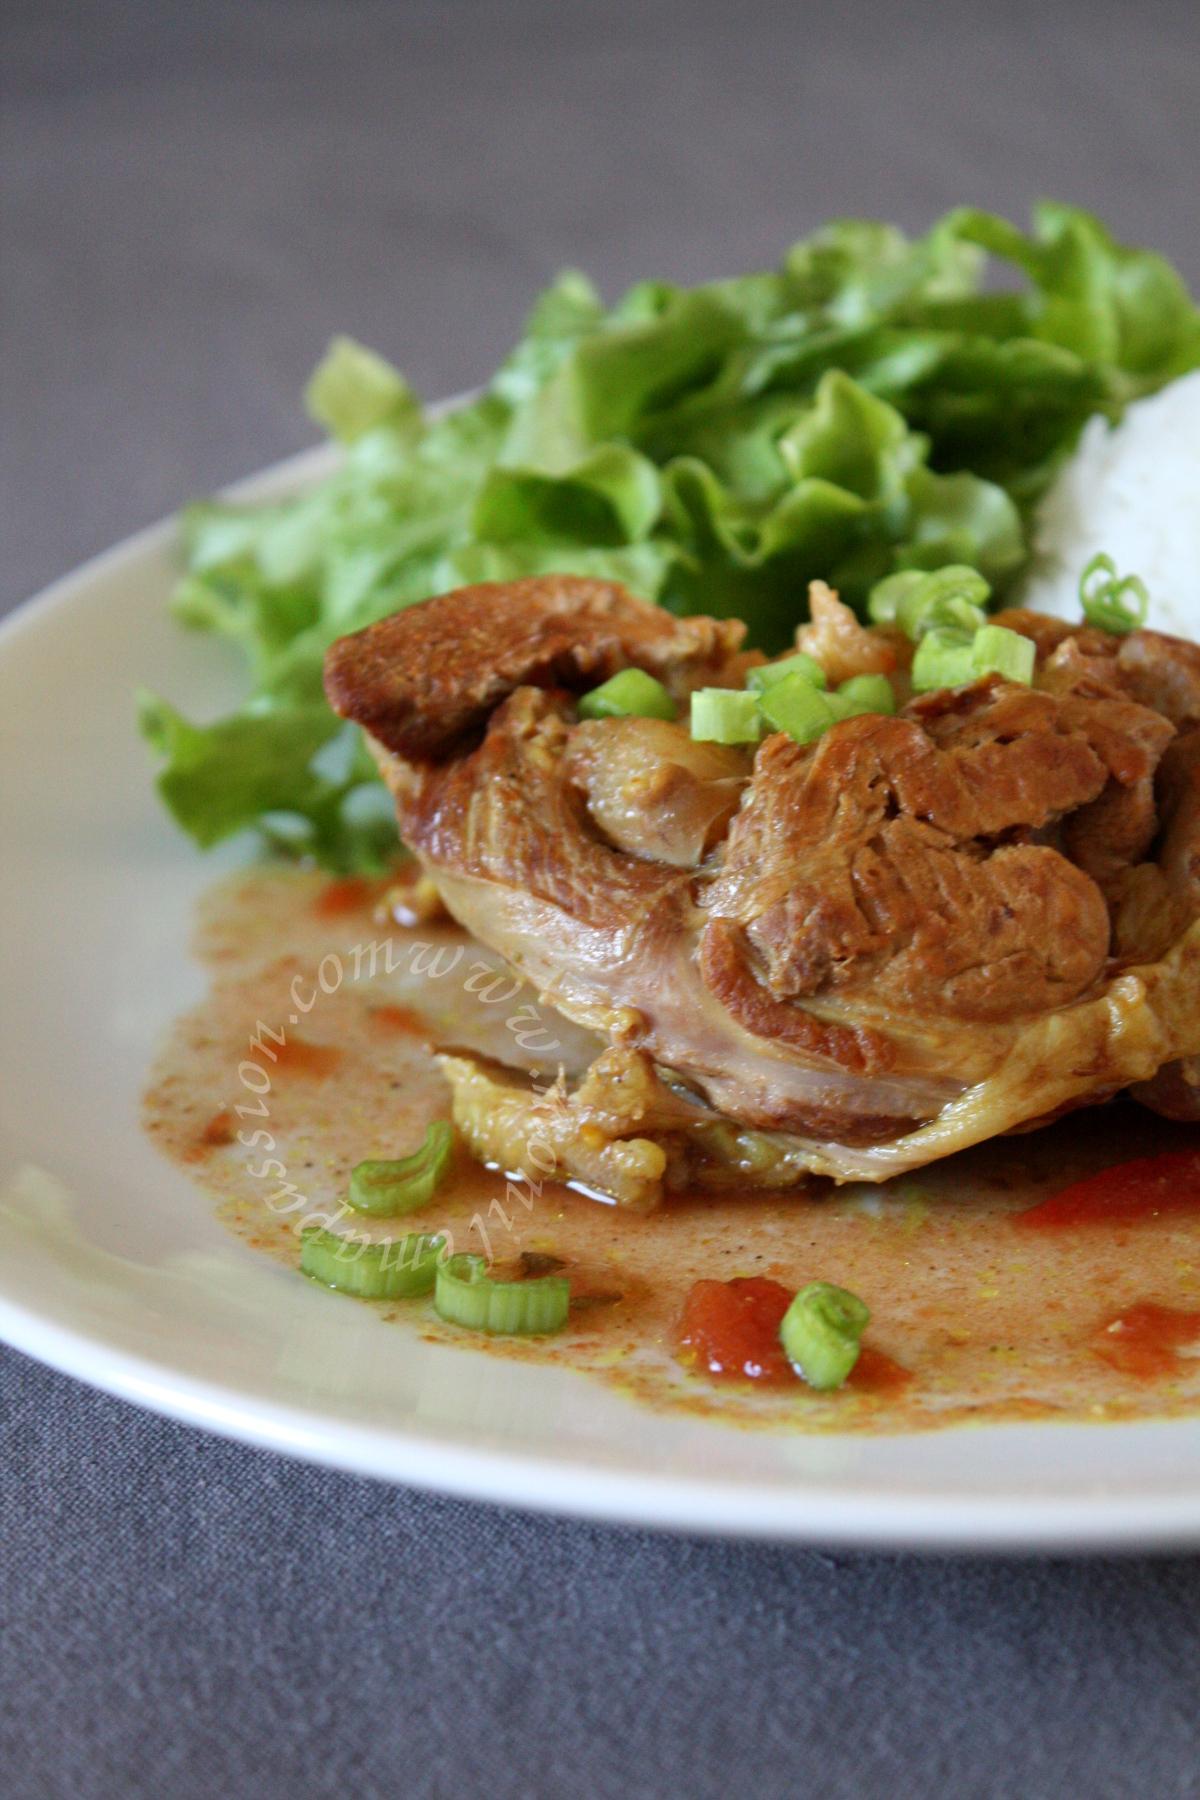 Osso bucco de dinde au Ras-el-hanout - Crock-Pot Moroccan Spiced Turkey Osso Buco